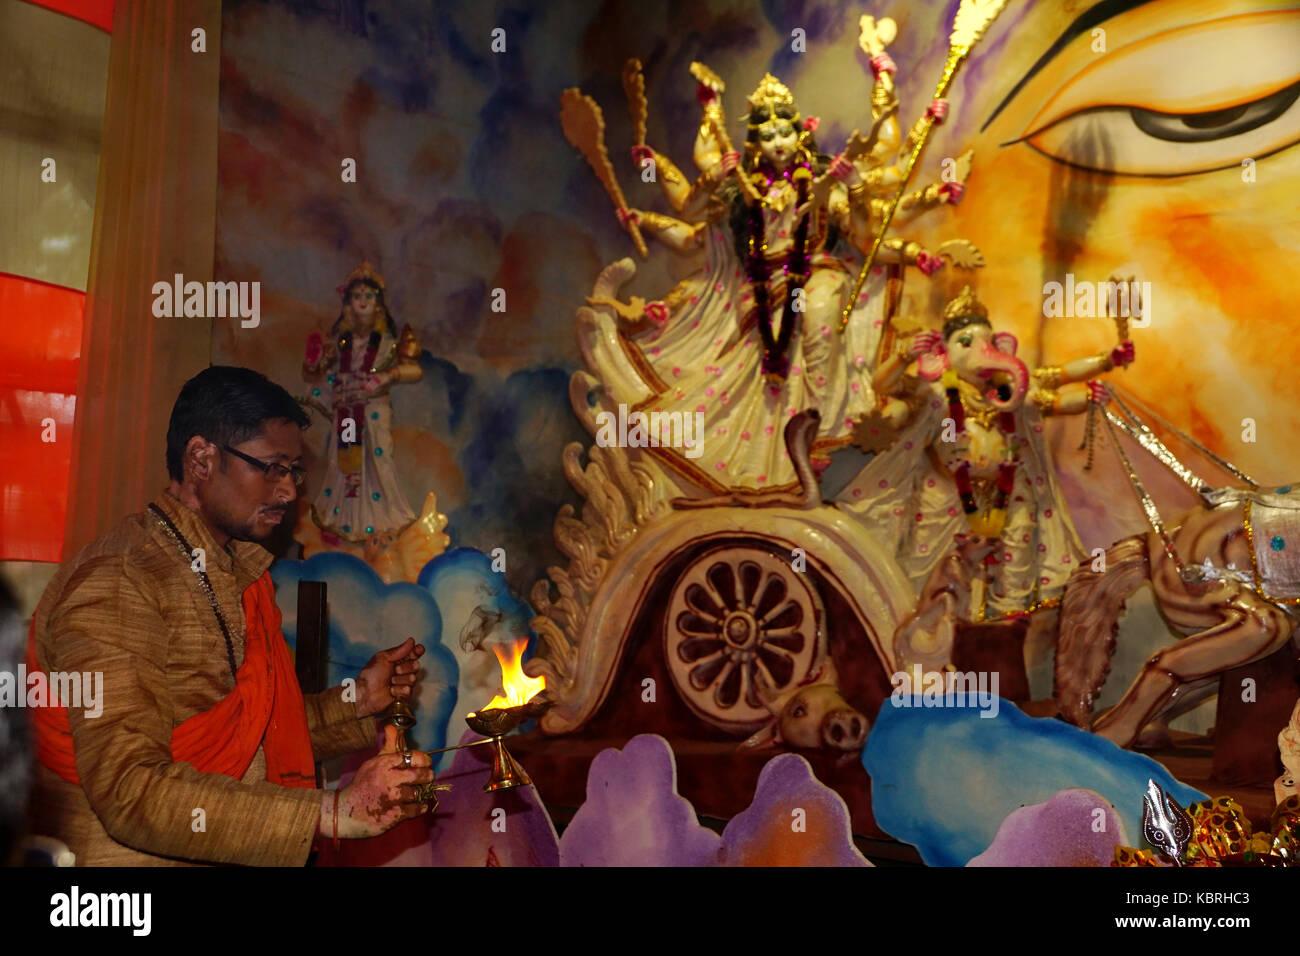 The Durga Puja Festival &  magnificent Idol Goddess Durga - Stock Image